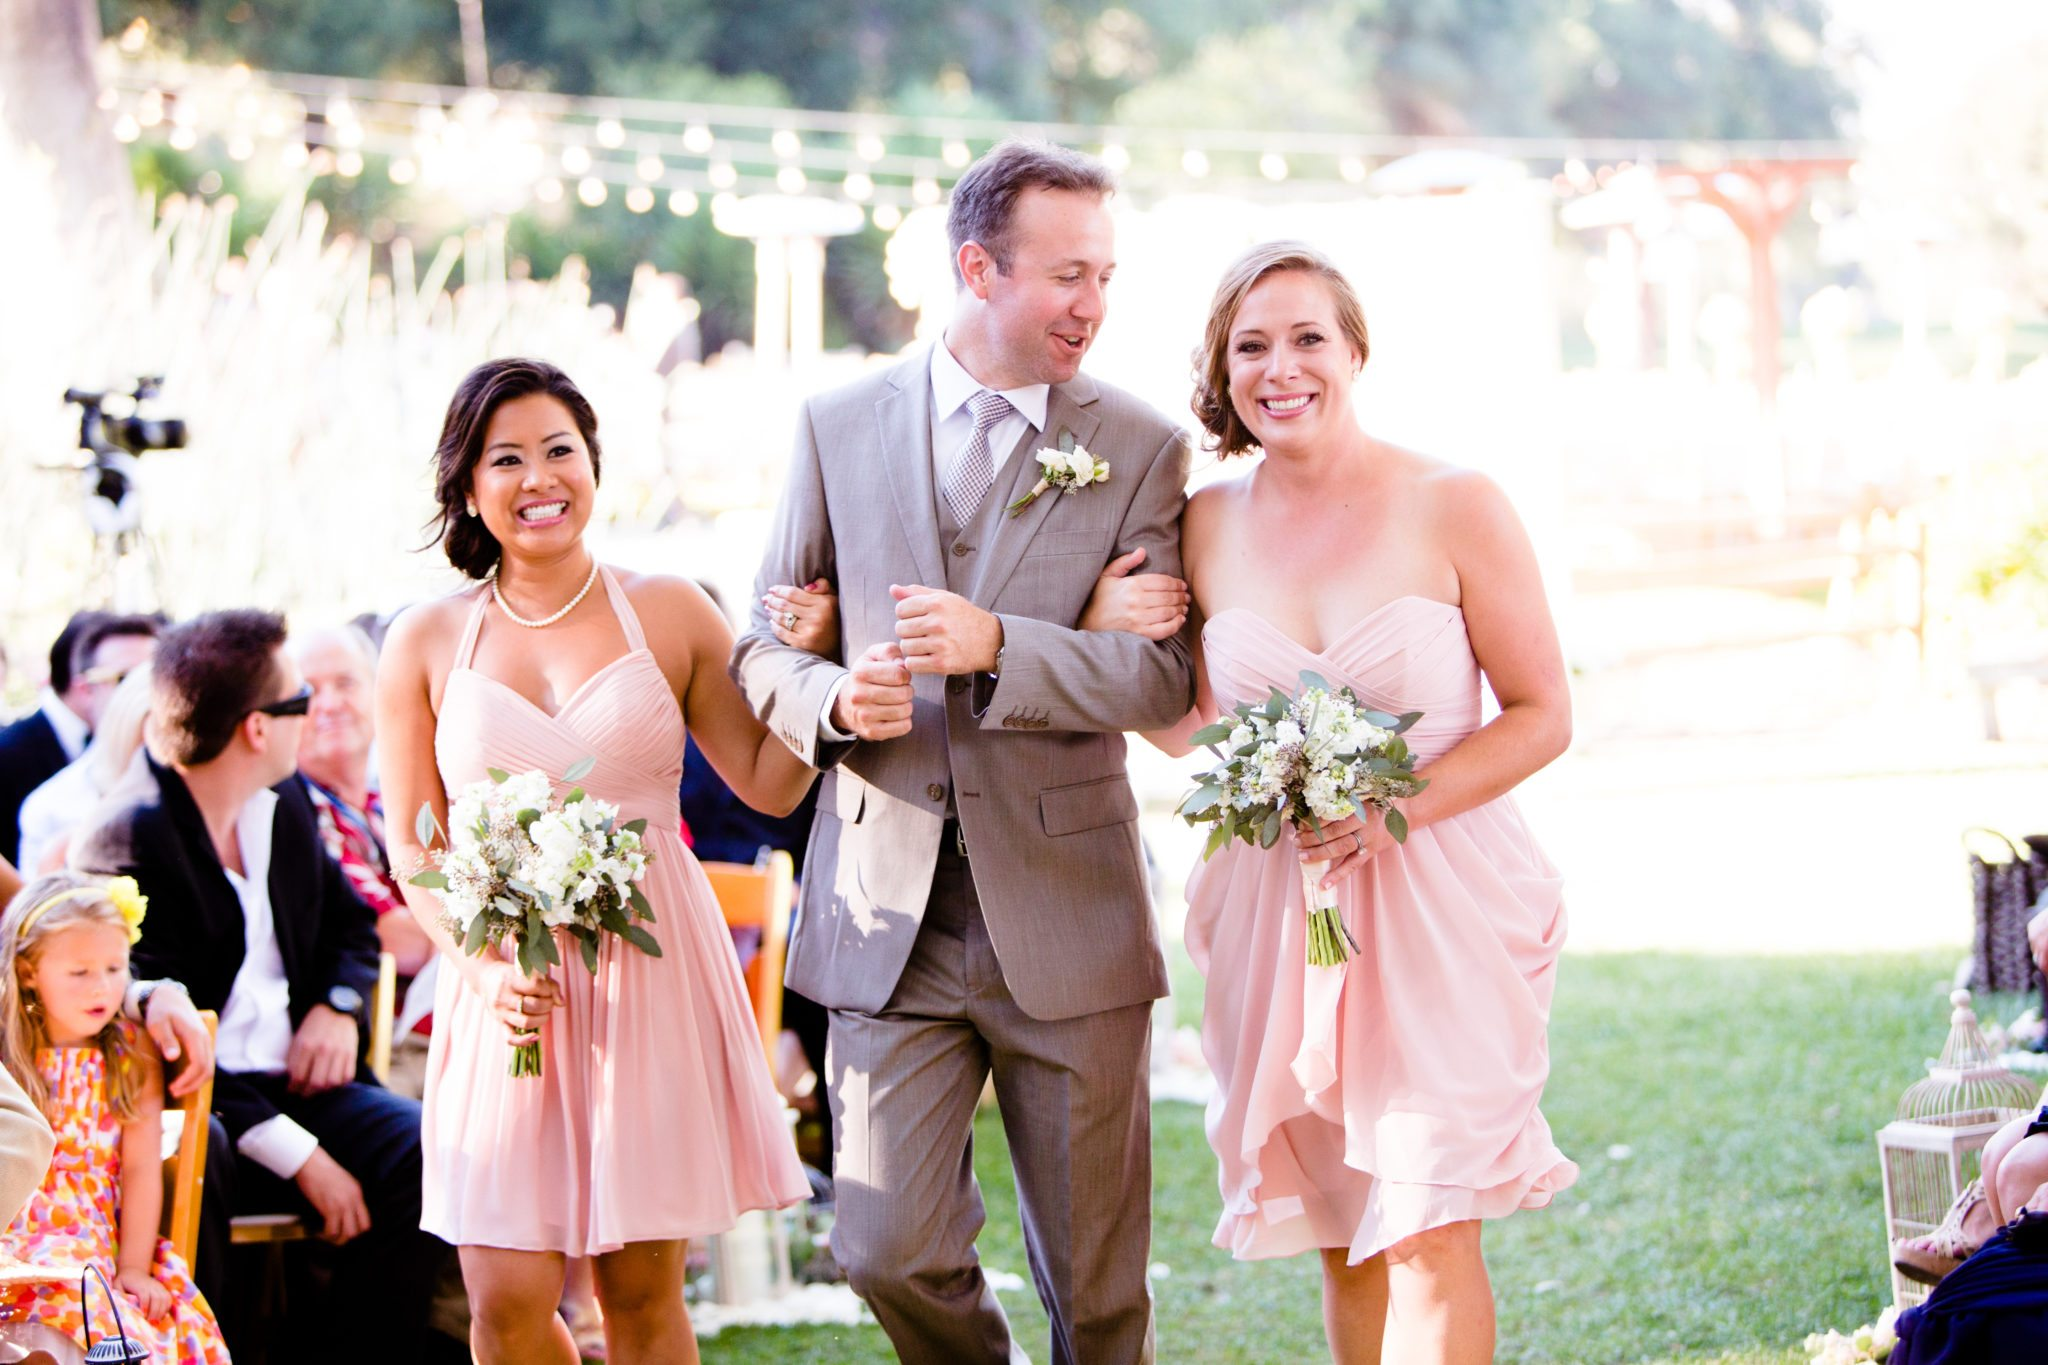 Temecula_Creek_Inn_Wedding_066.jpg